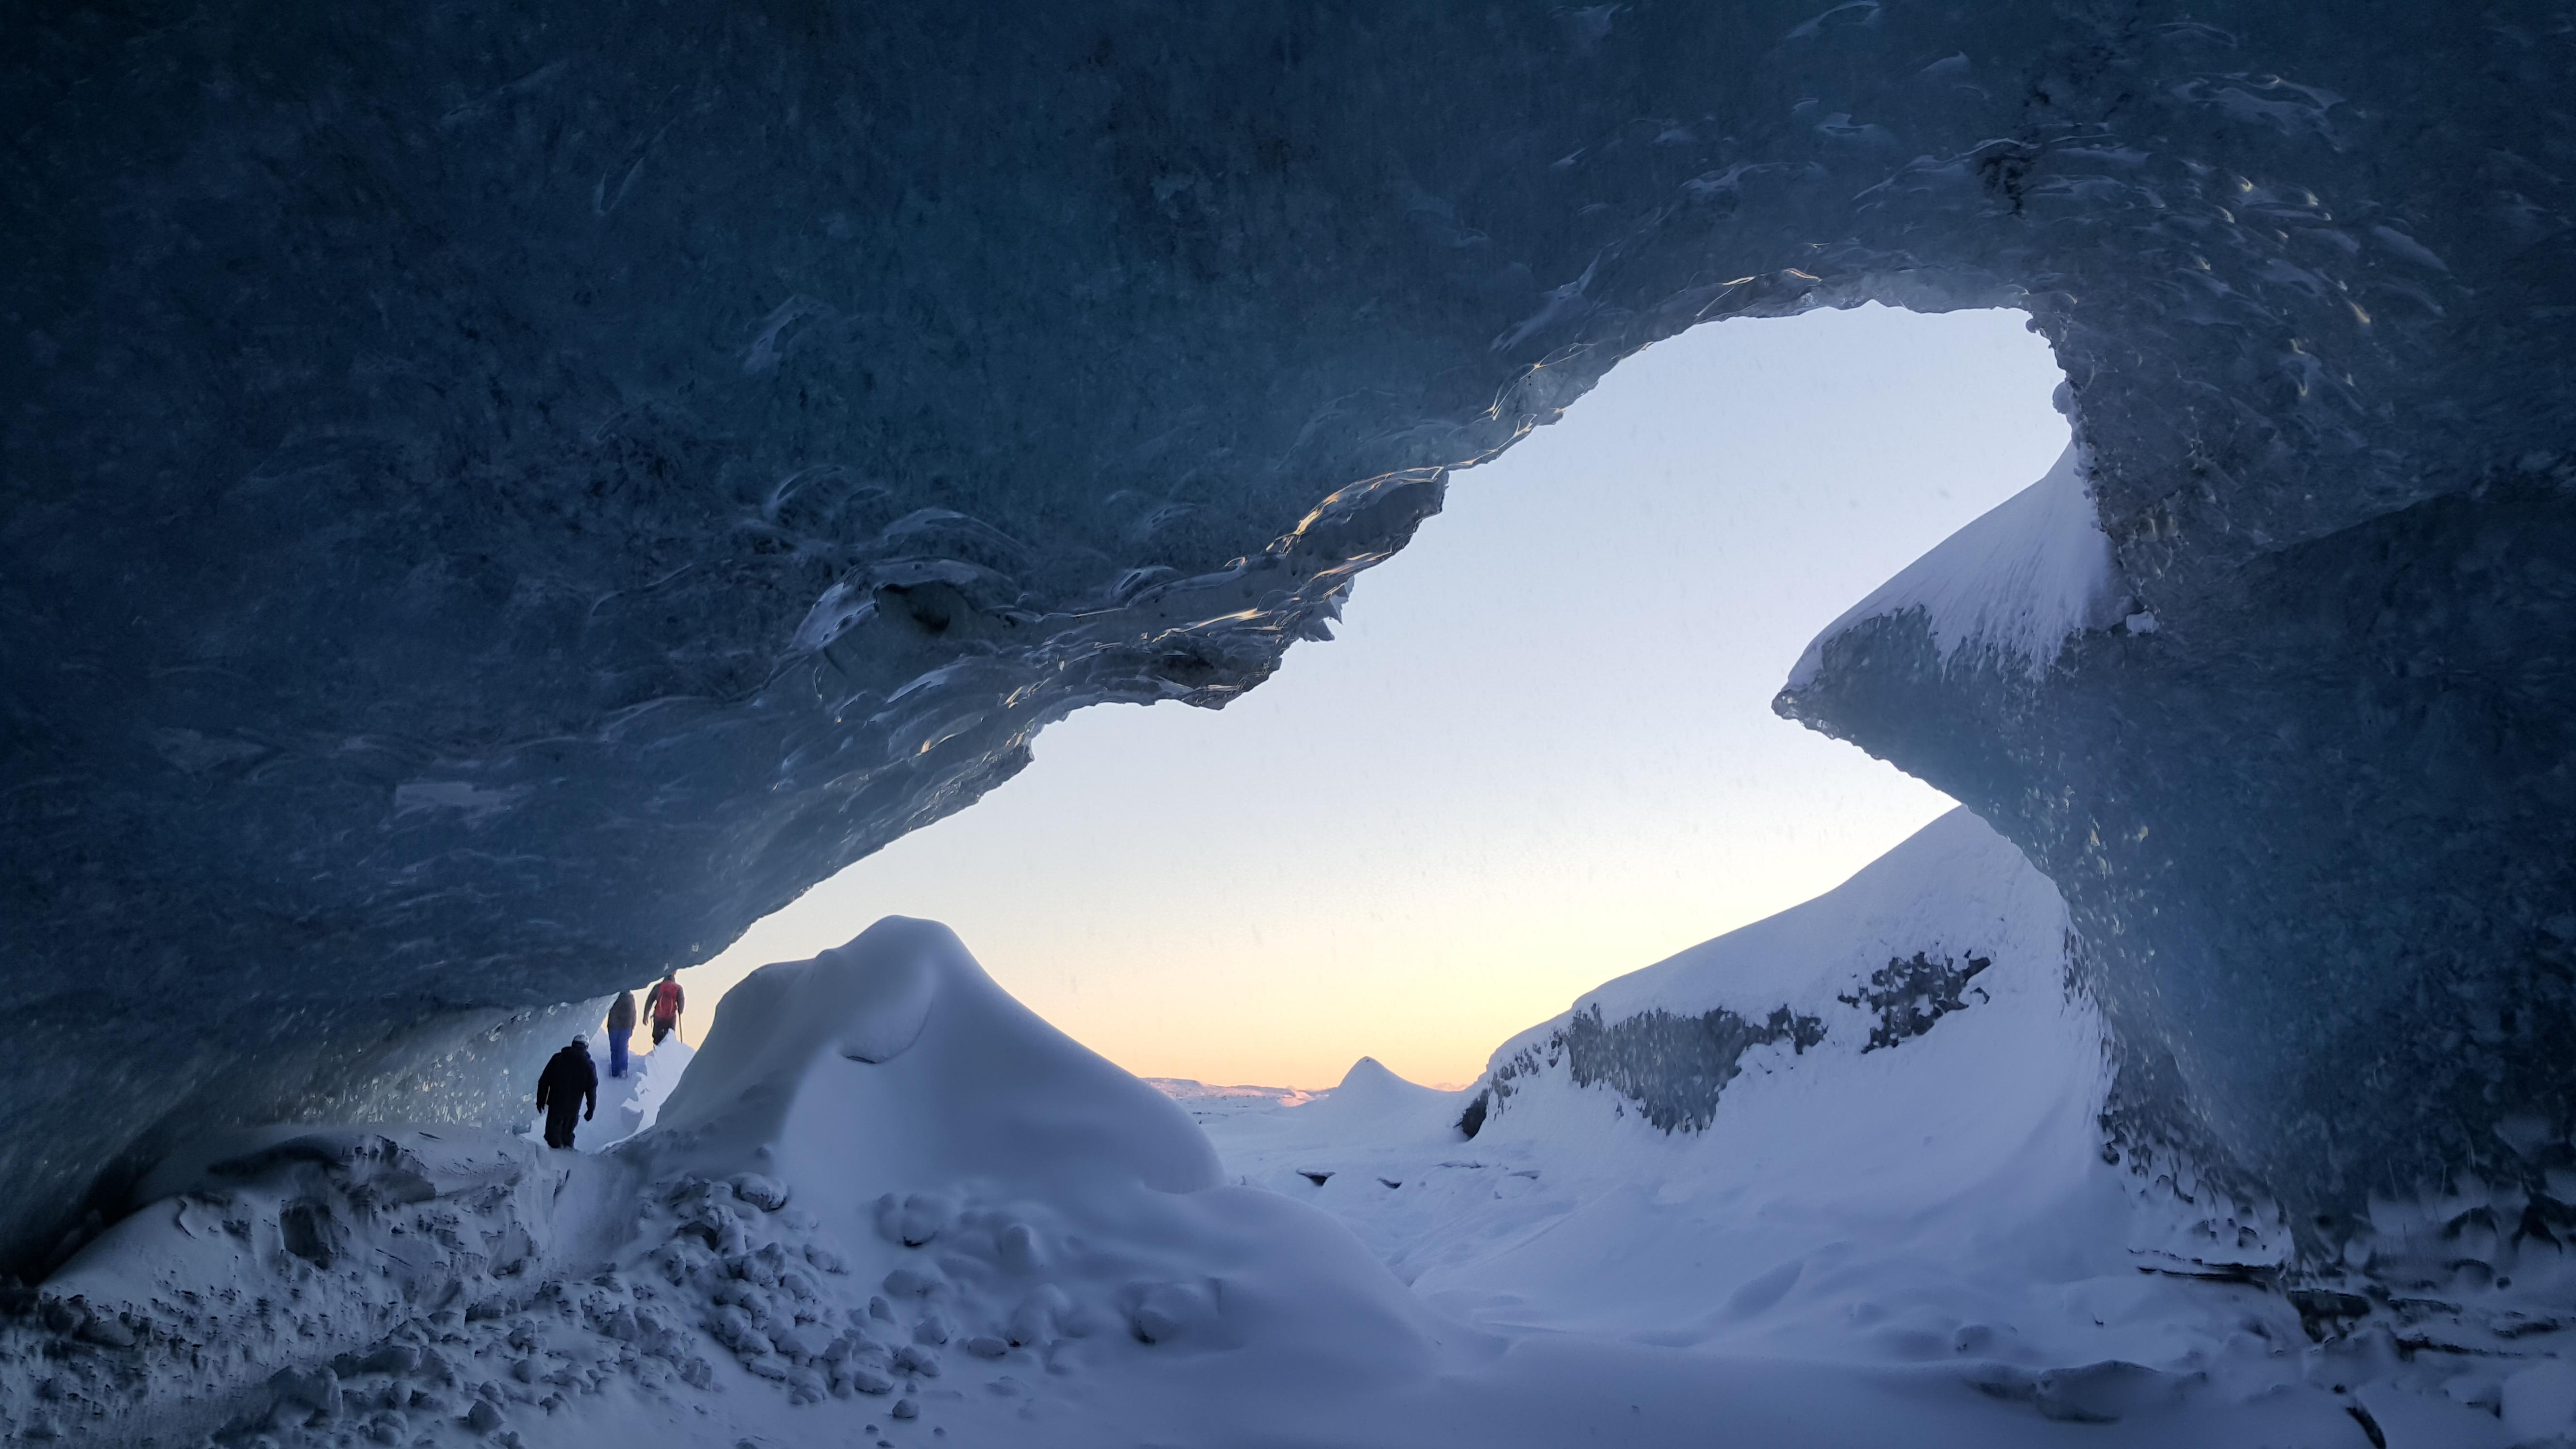 natuerliche-eishoehlen-vatnajoekull-ausflug-ausblick-hoehle